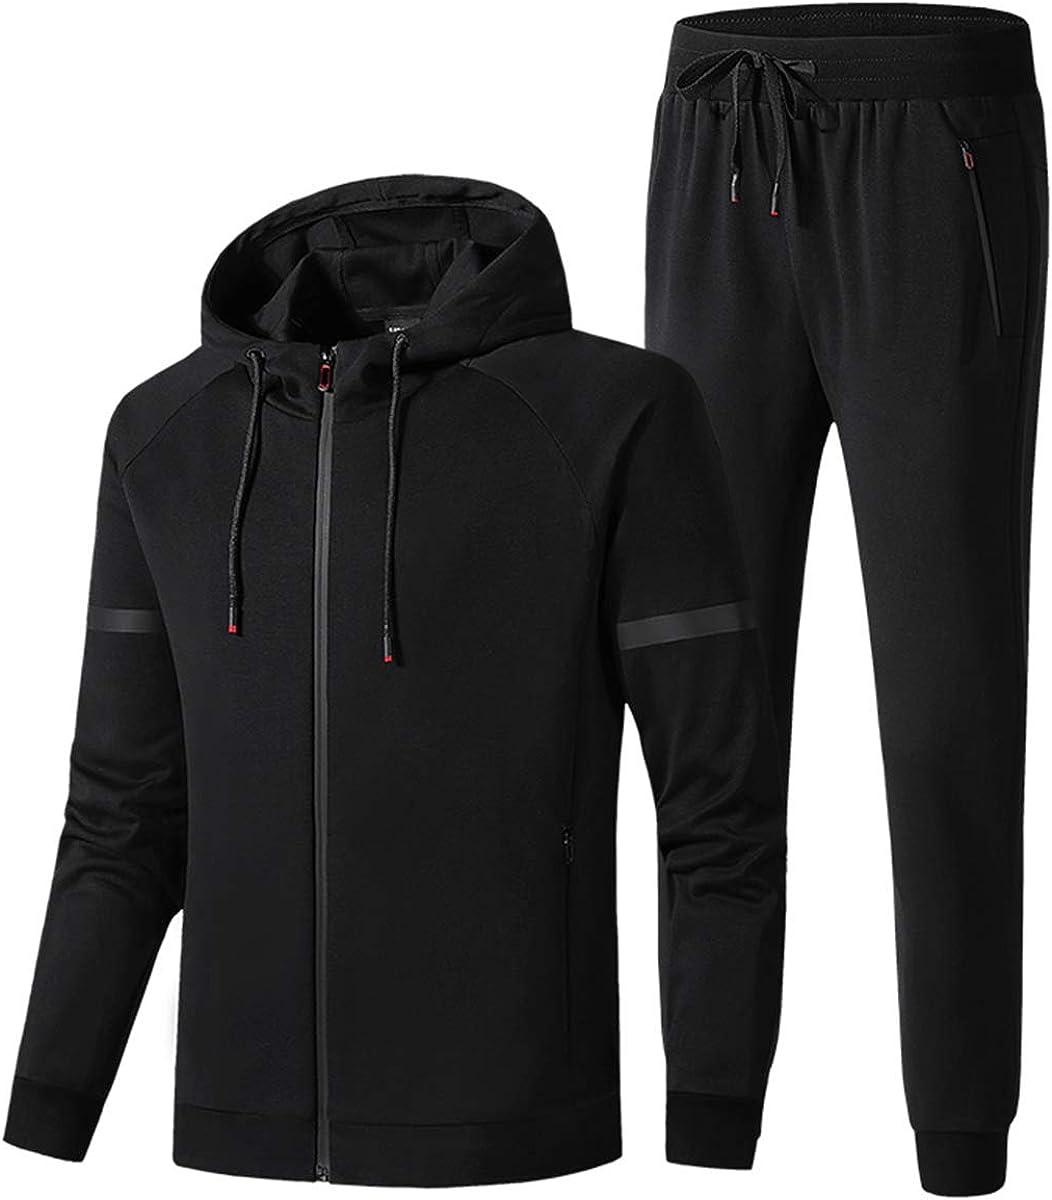 Mens Tracksuit Set Ribbed Grey Hoodie Top Bottoms Jogging Pants Gym Joggers L